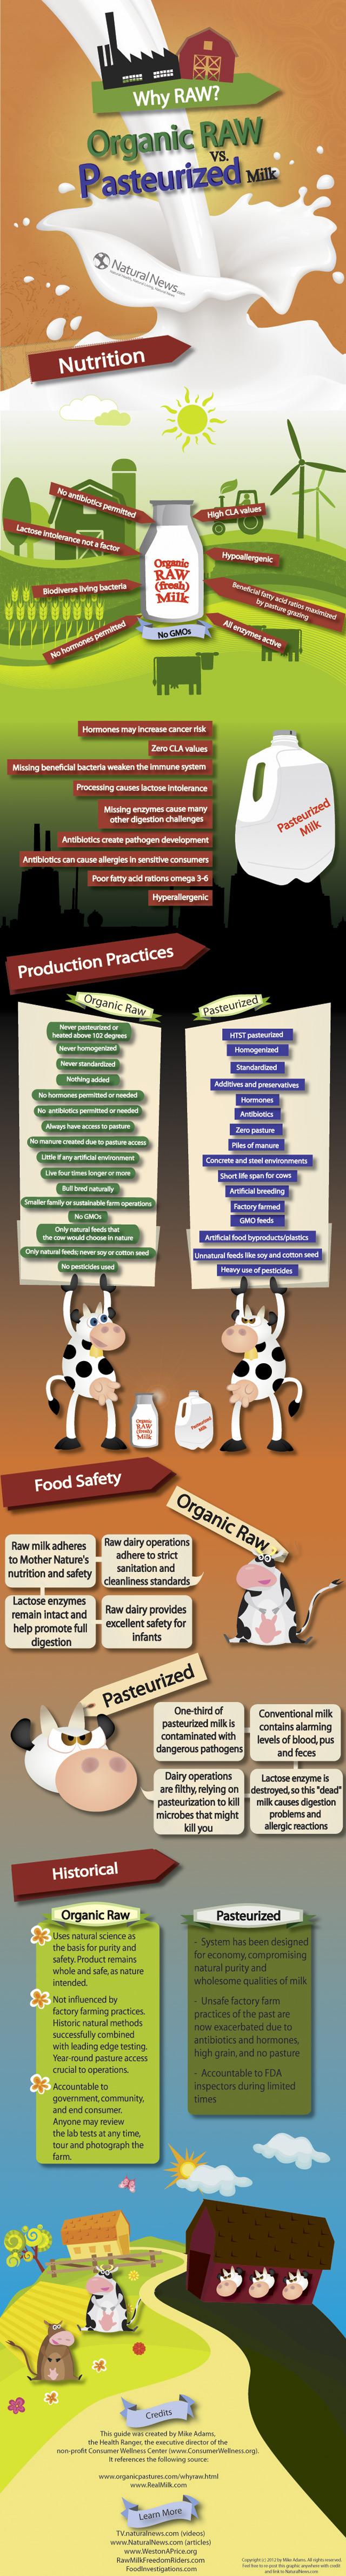 Organic vs Pasteurized Milk